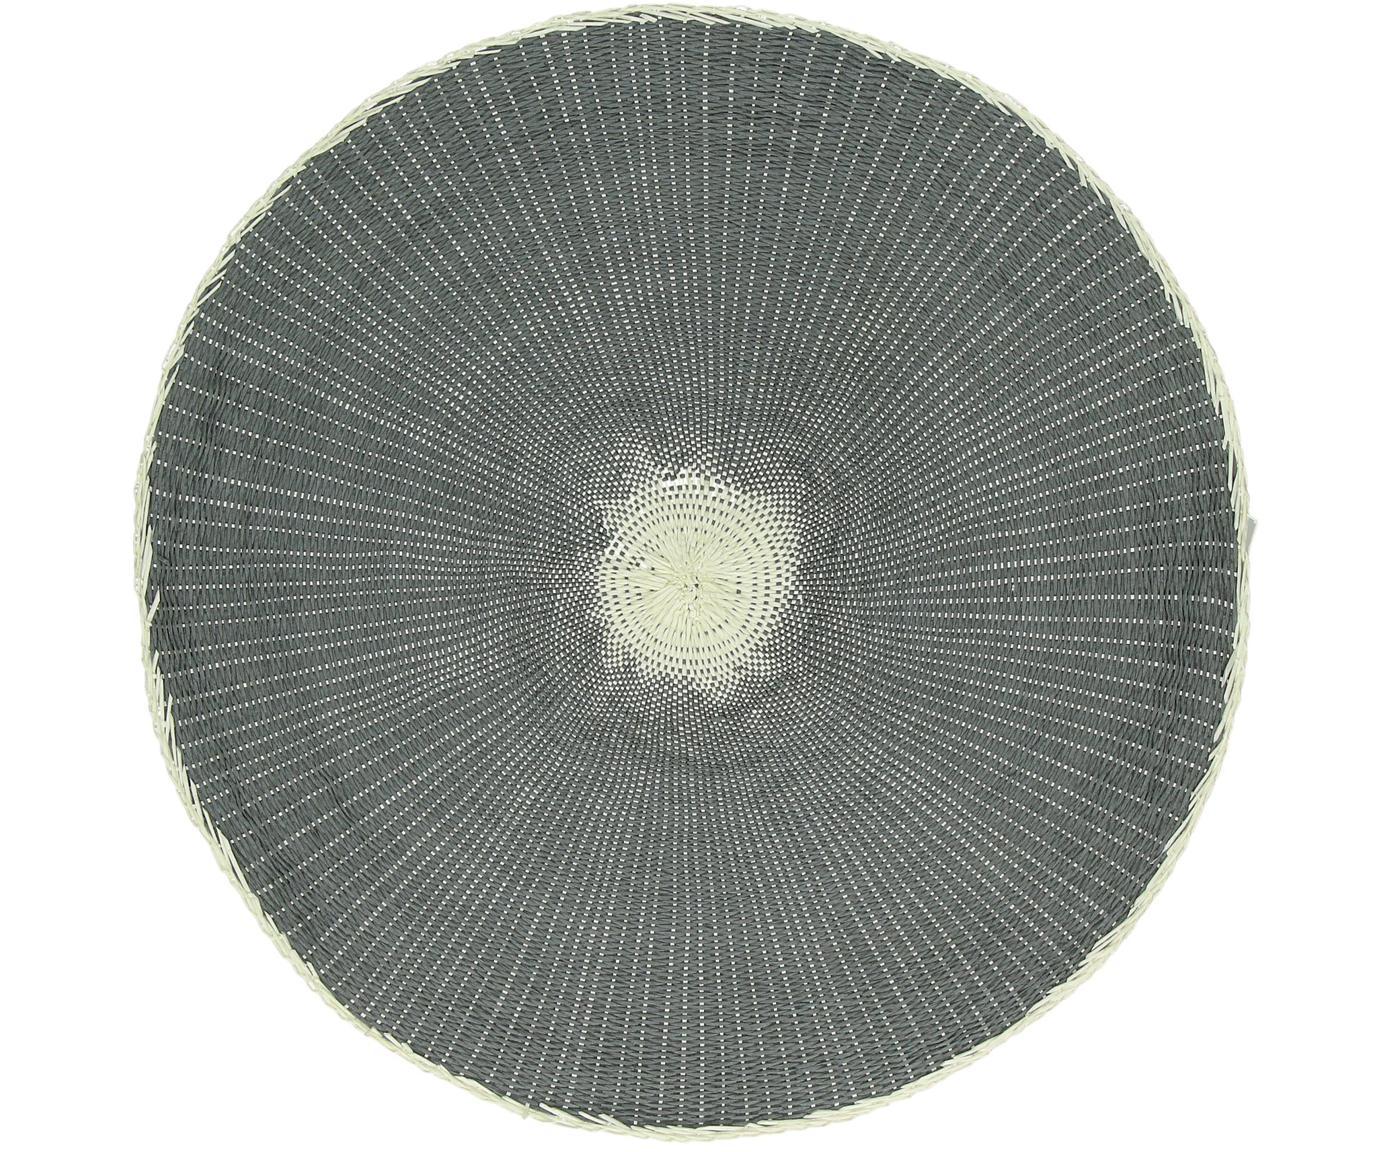 Manteles individuales redondos Eclat, 2uds., Fibras de papel, Gris, crema, Ø 38 cm